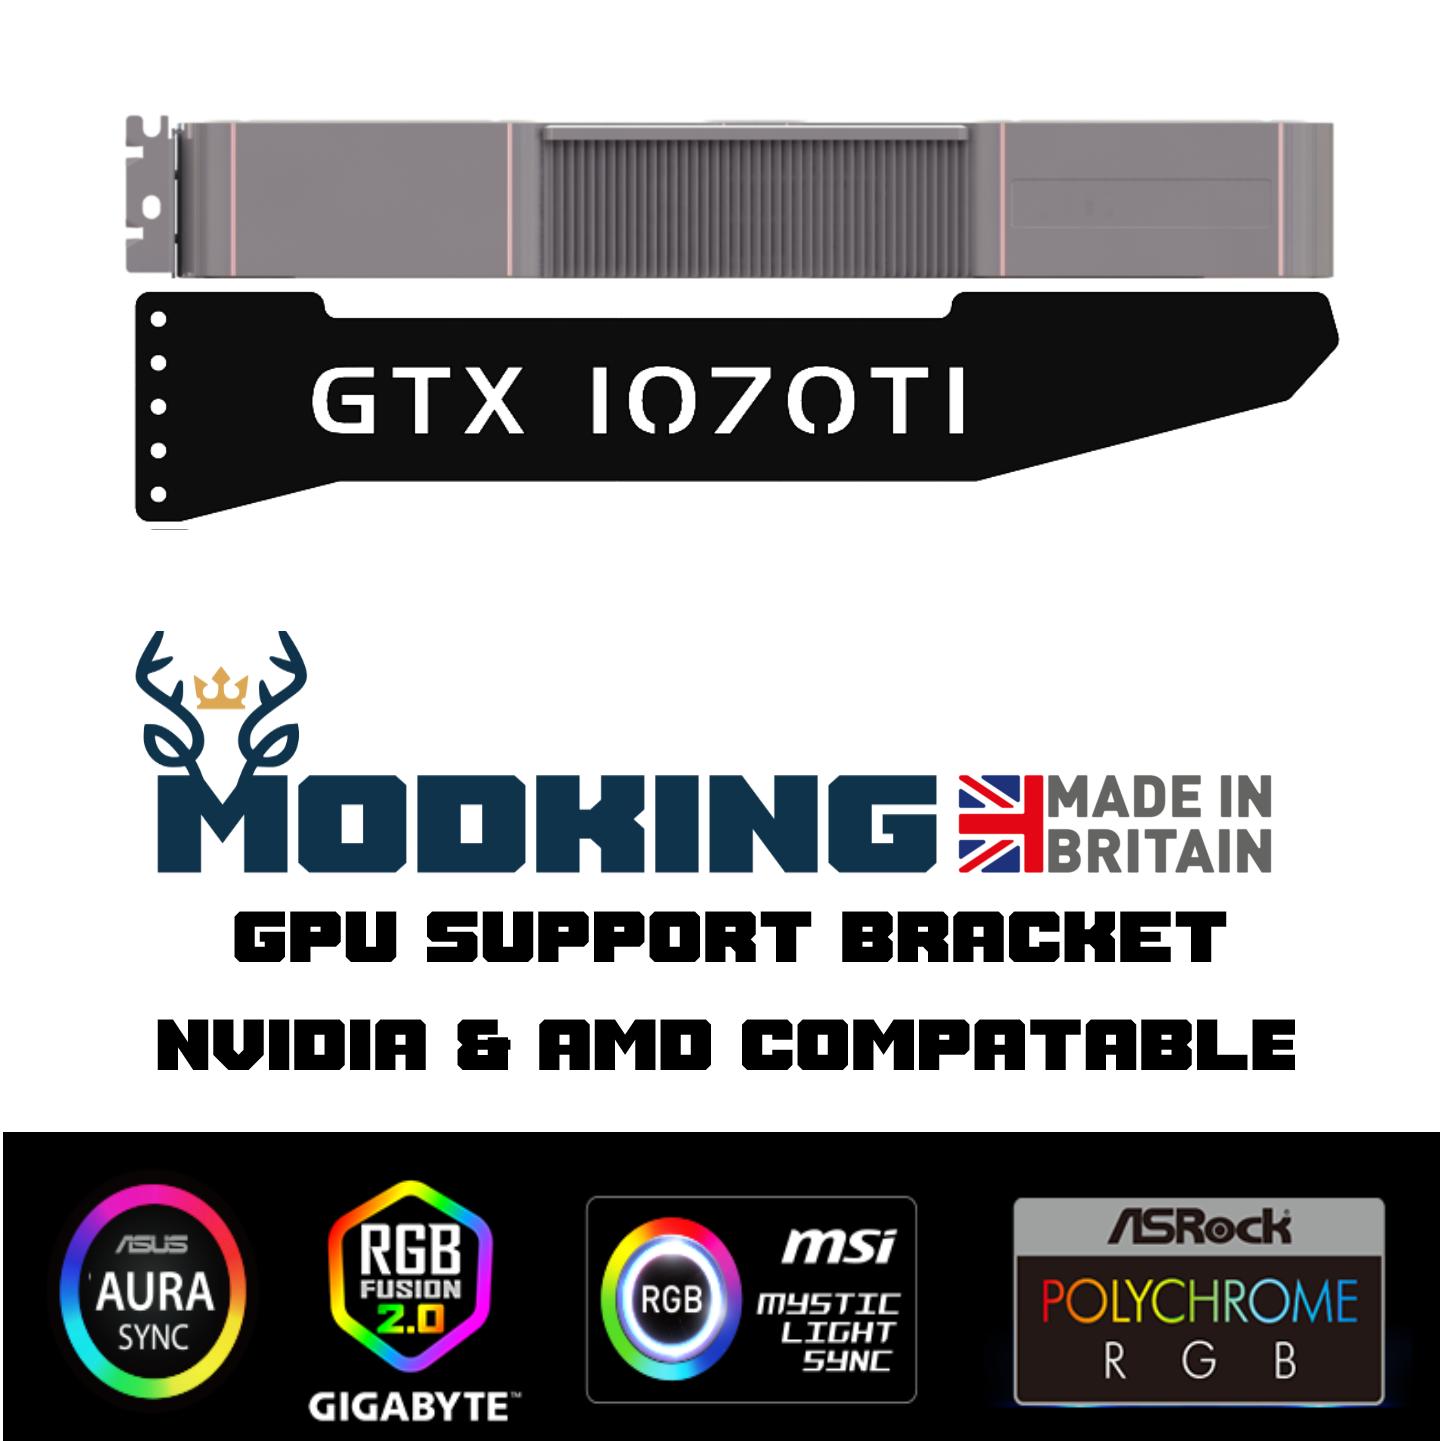 GTX 1070TI - ARGB GPU Graphics Card Sag Support Bracket Brace gtx RTX AMD NVIDIA